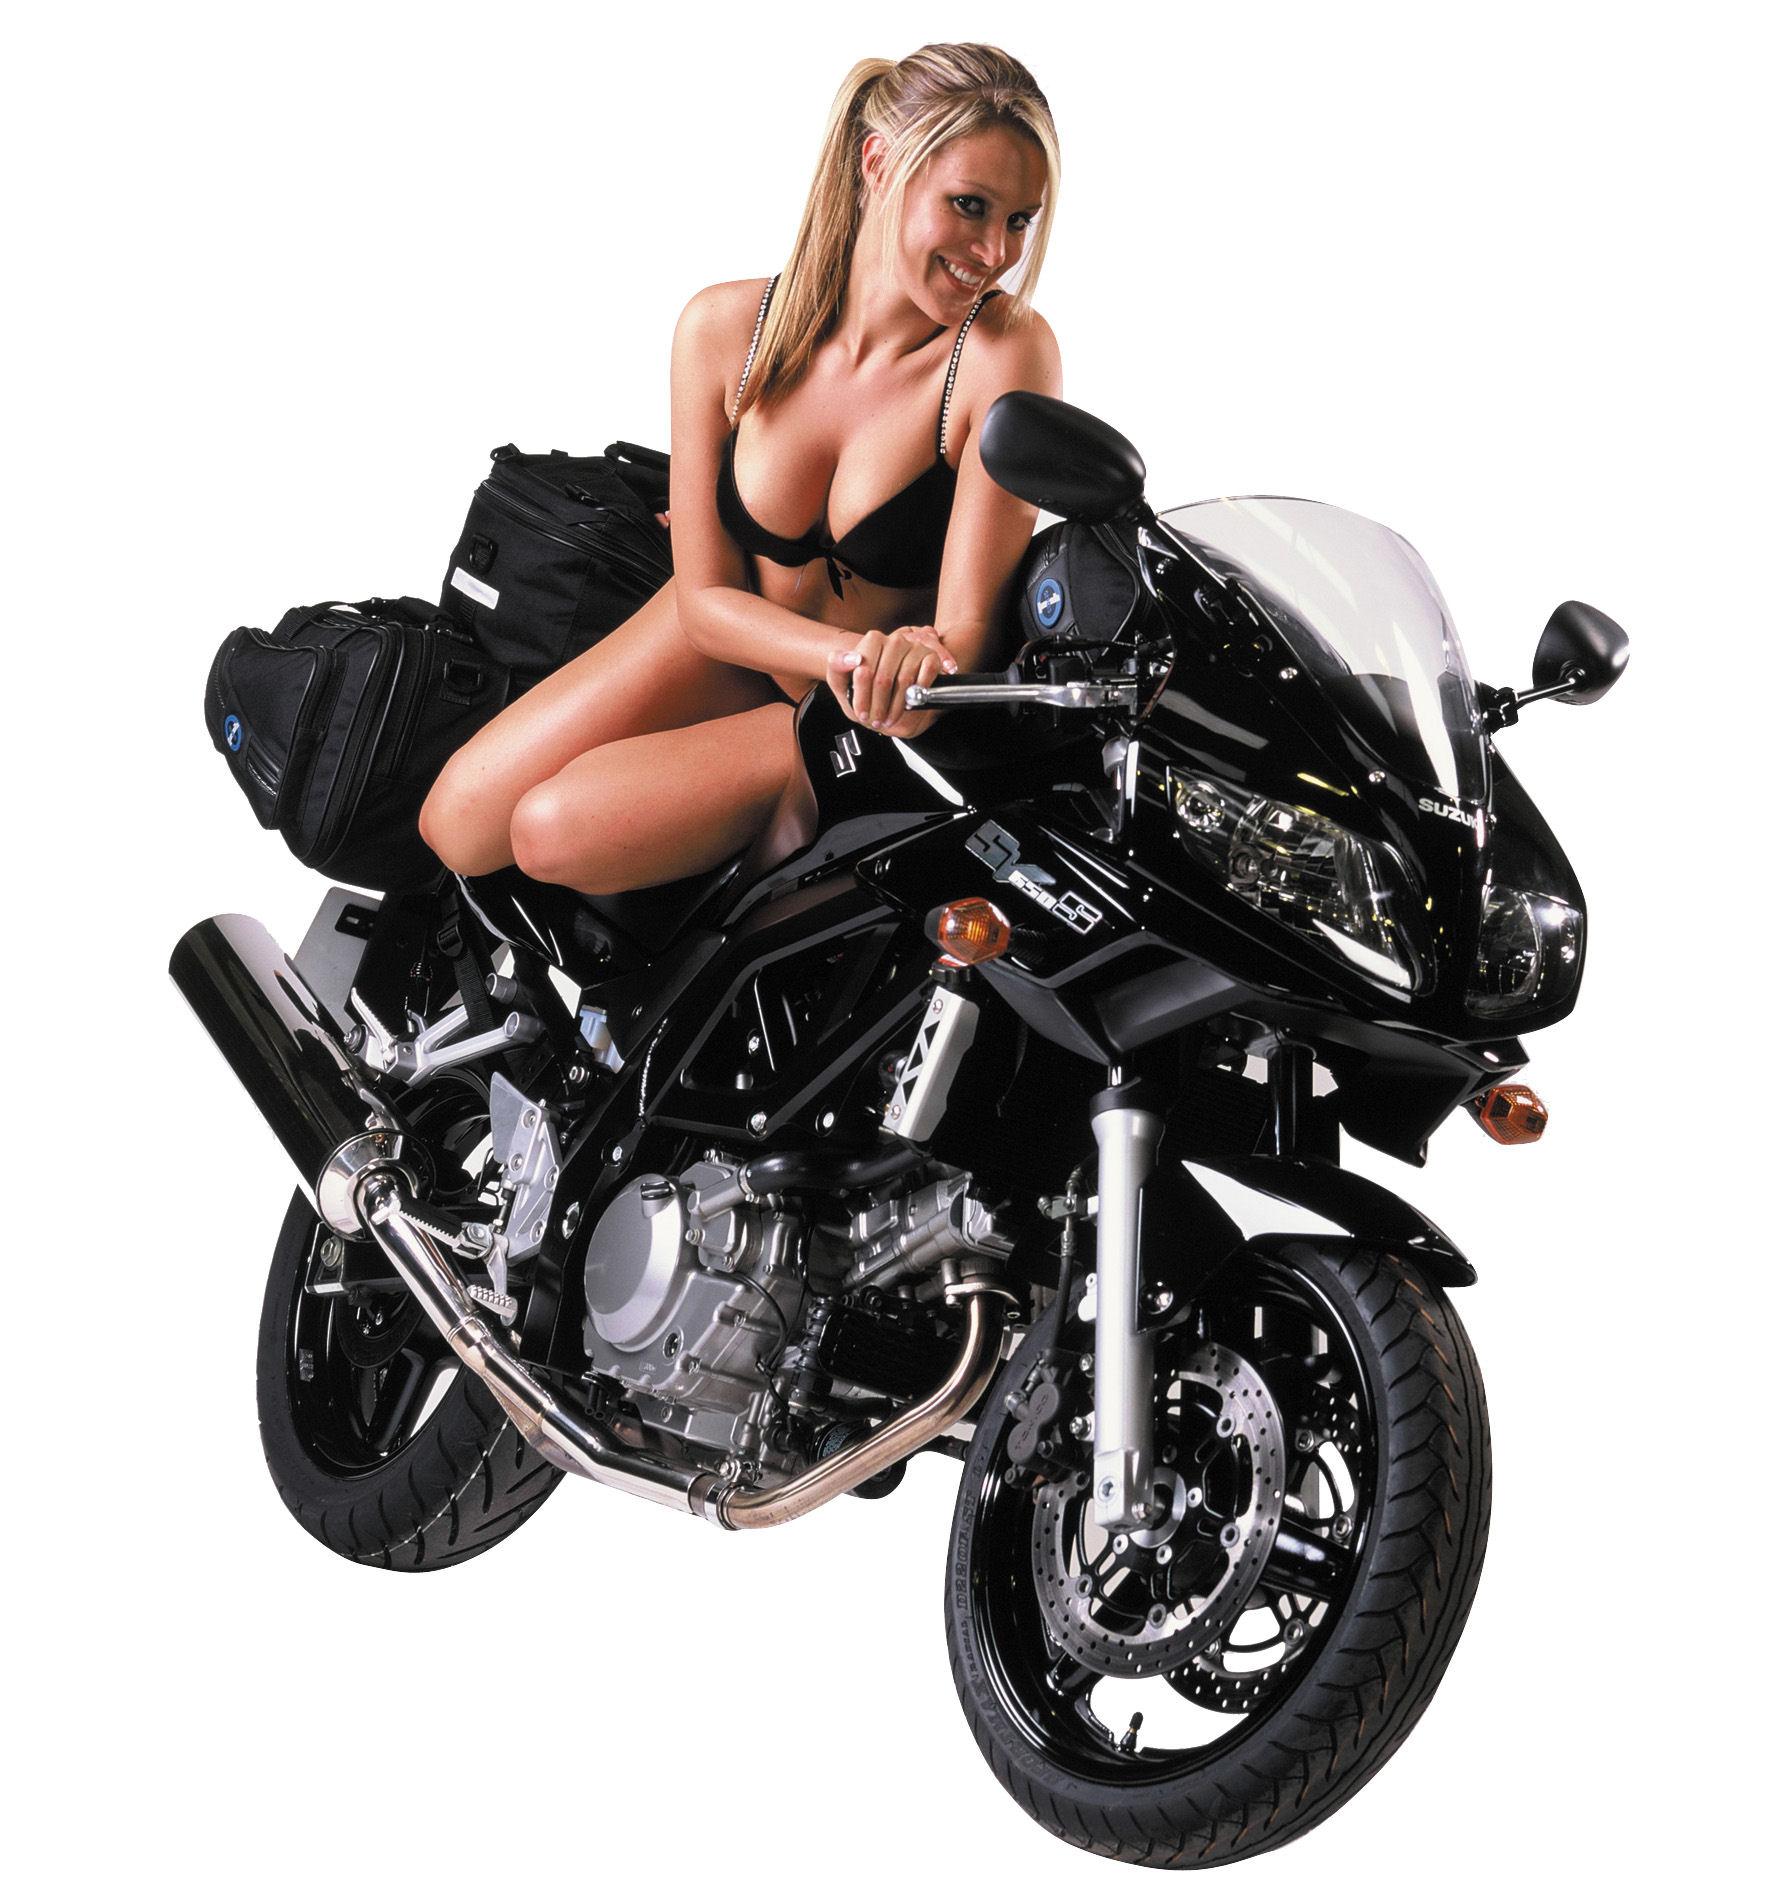 nude-young-biker-girl-nude-wallpapers-sex